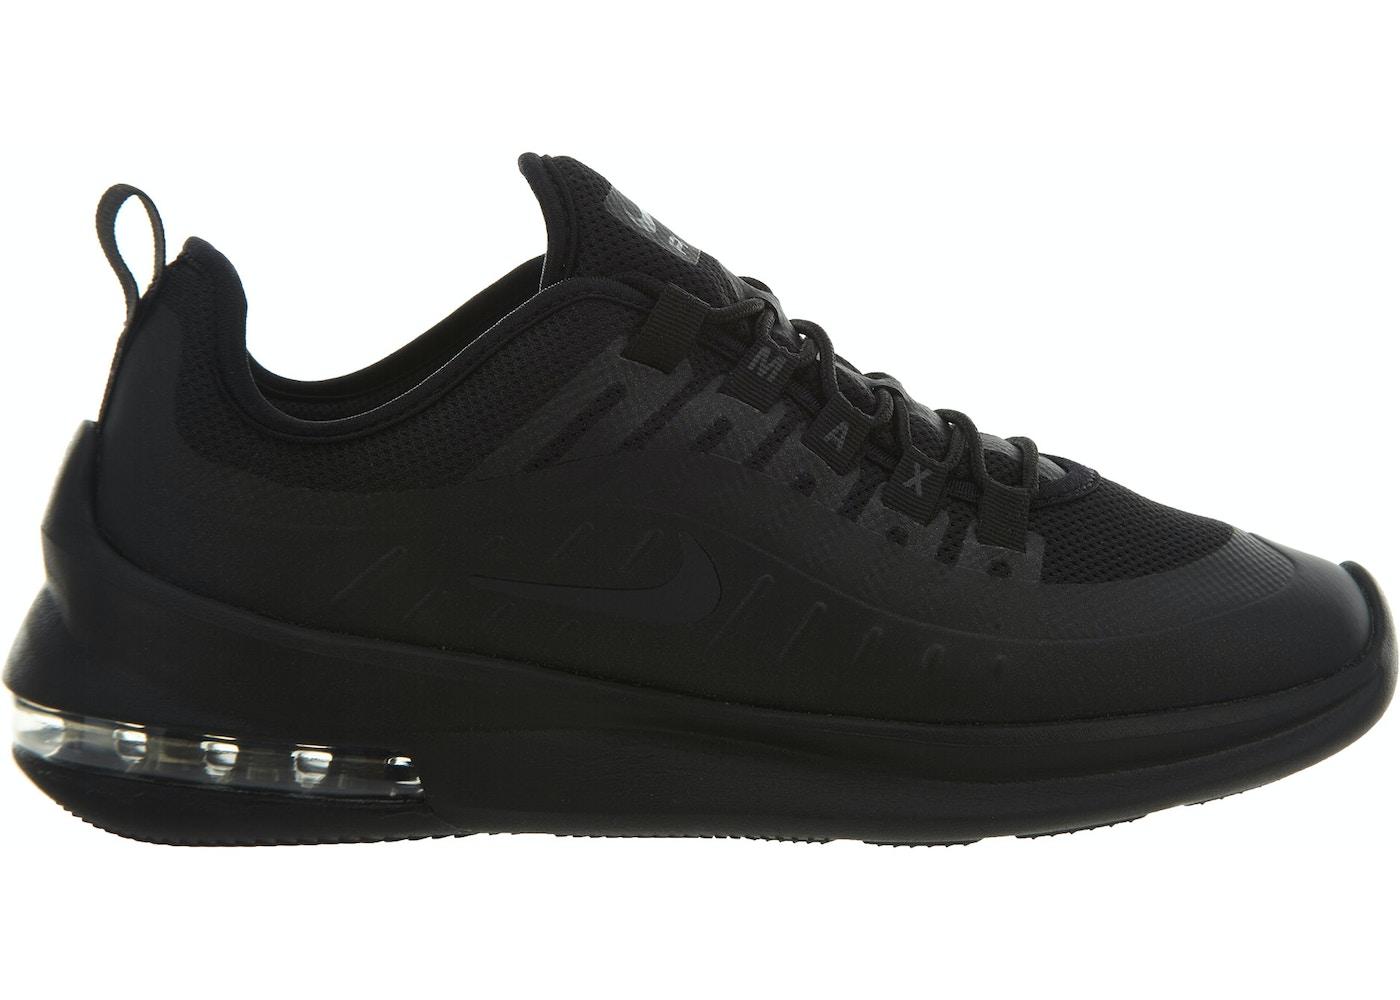 Sí misma Meandro dignidad  Nike Air Max Axis Black Anthracite - AA2146-006